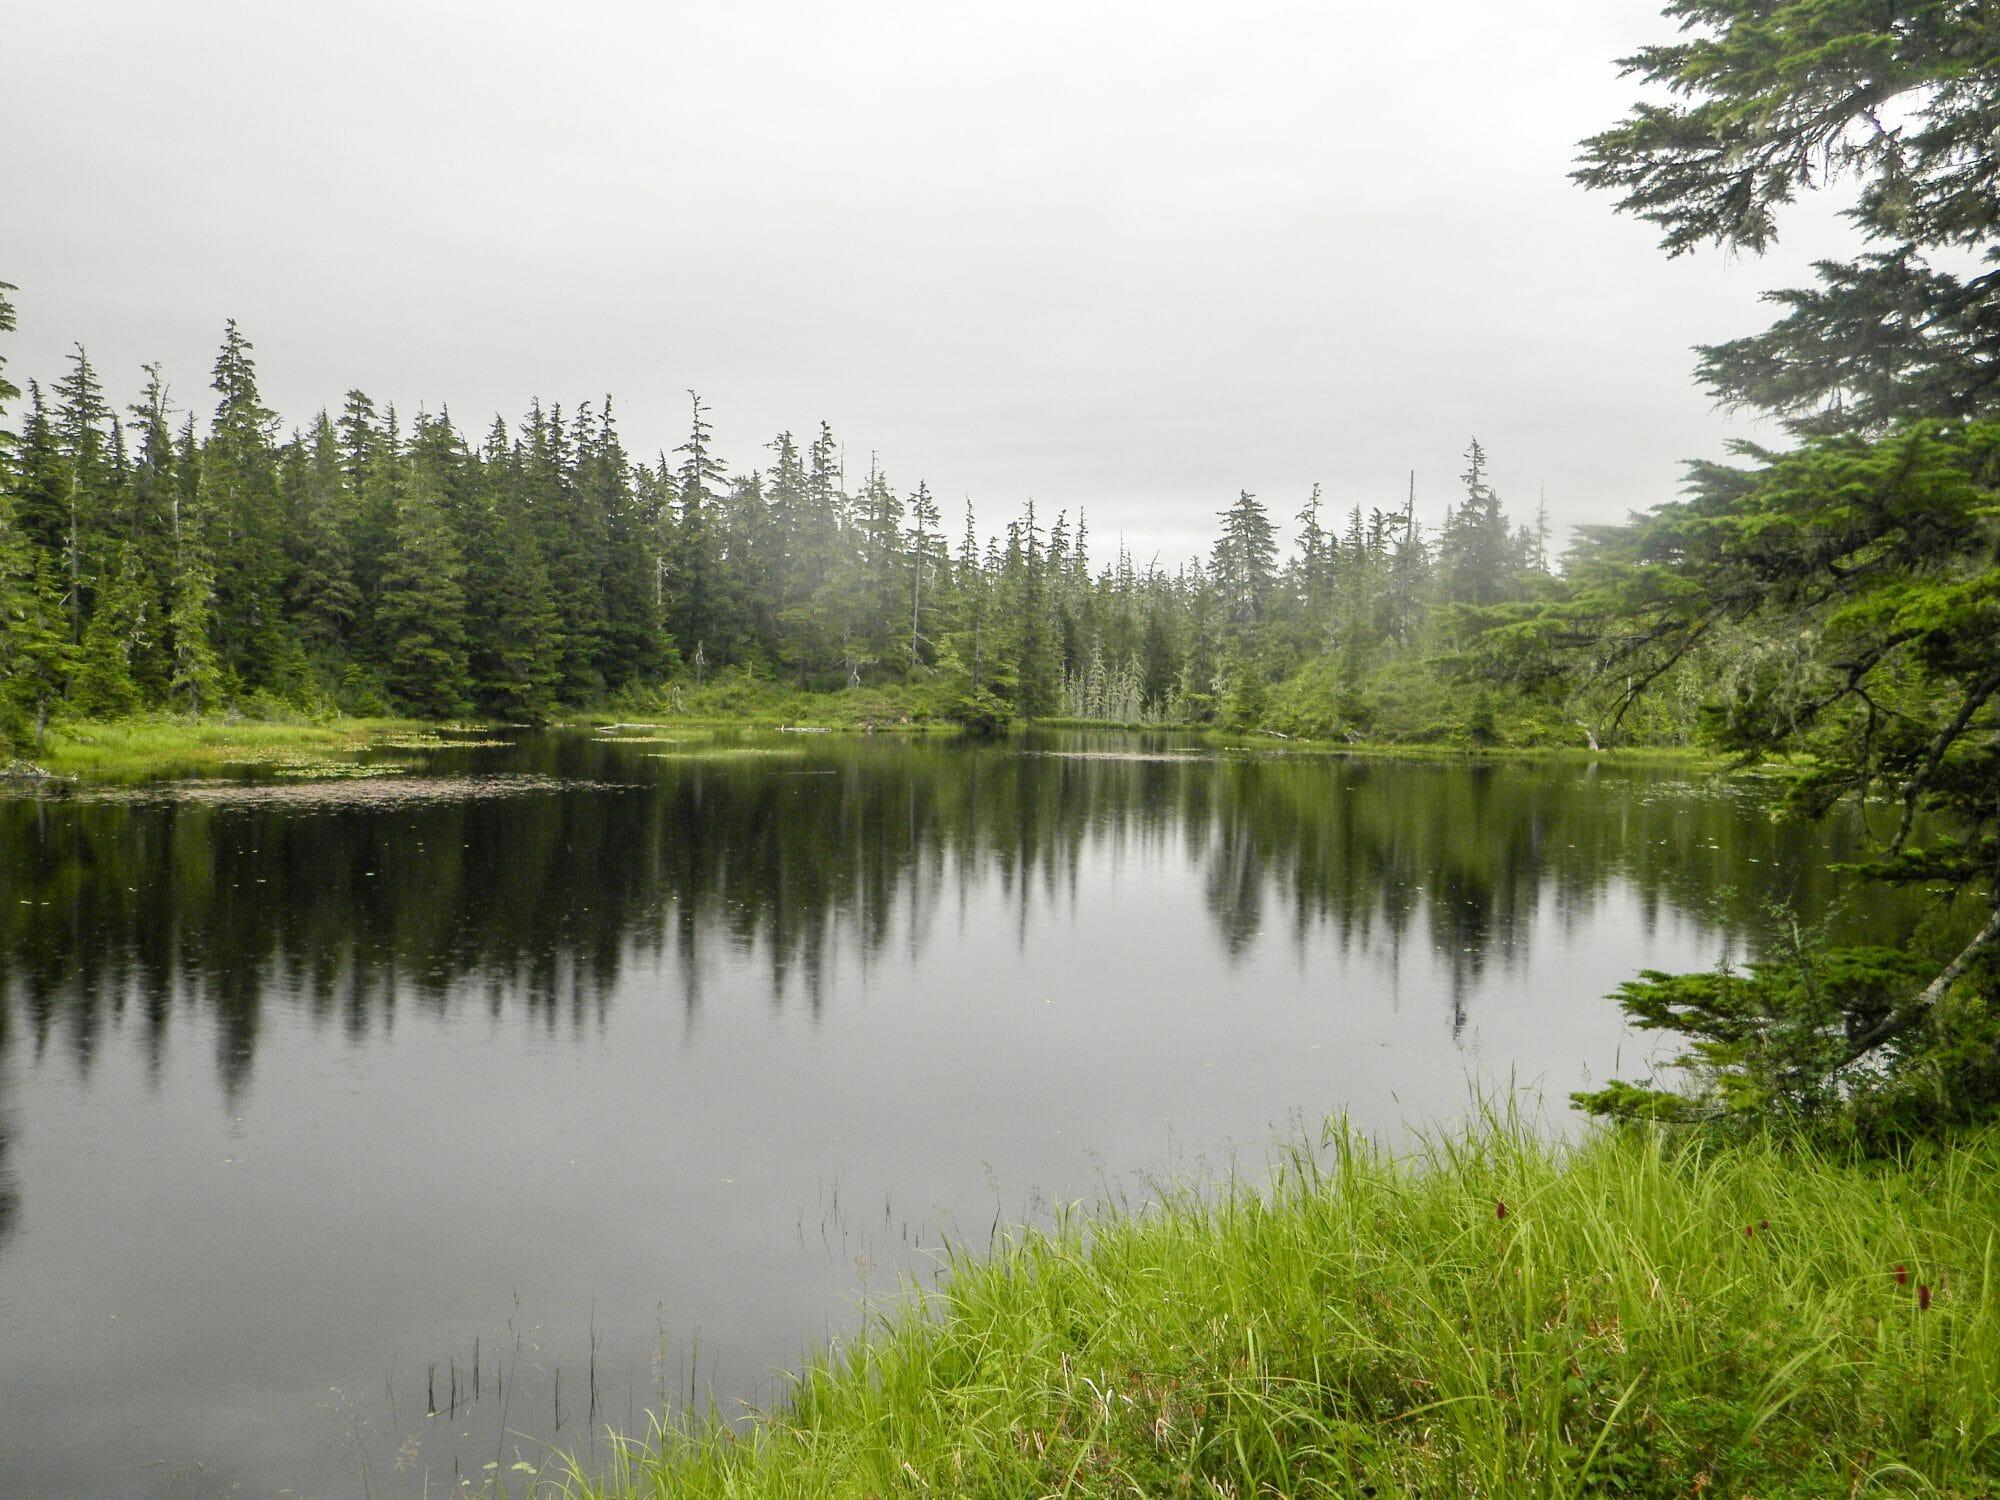 Gunnuk Creek N. - Kake, Alaska